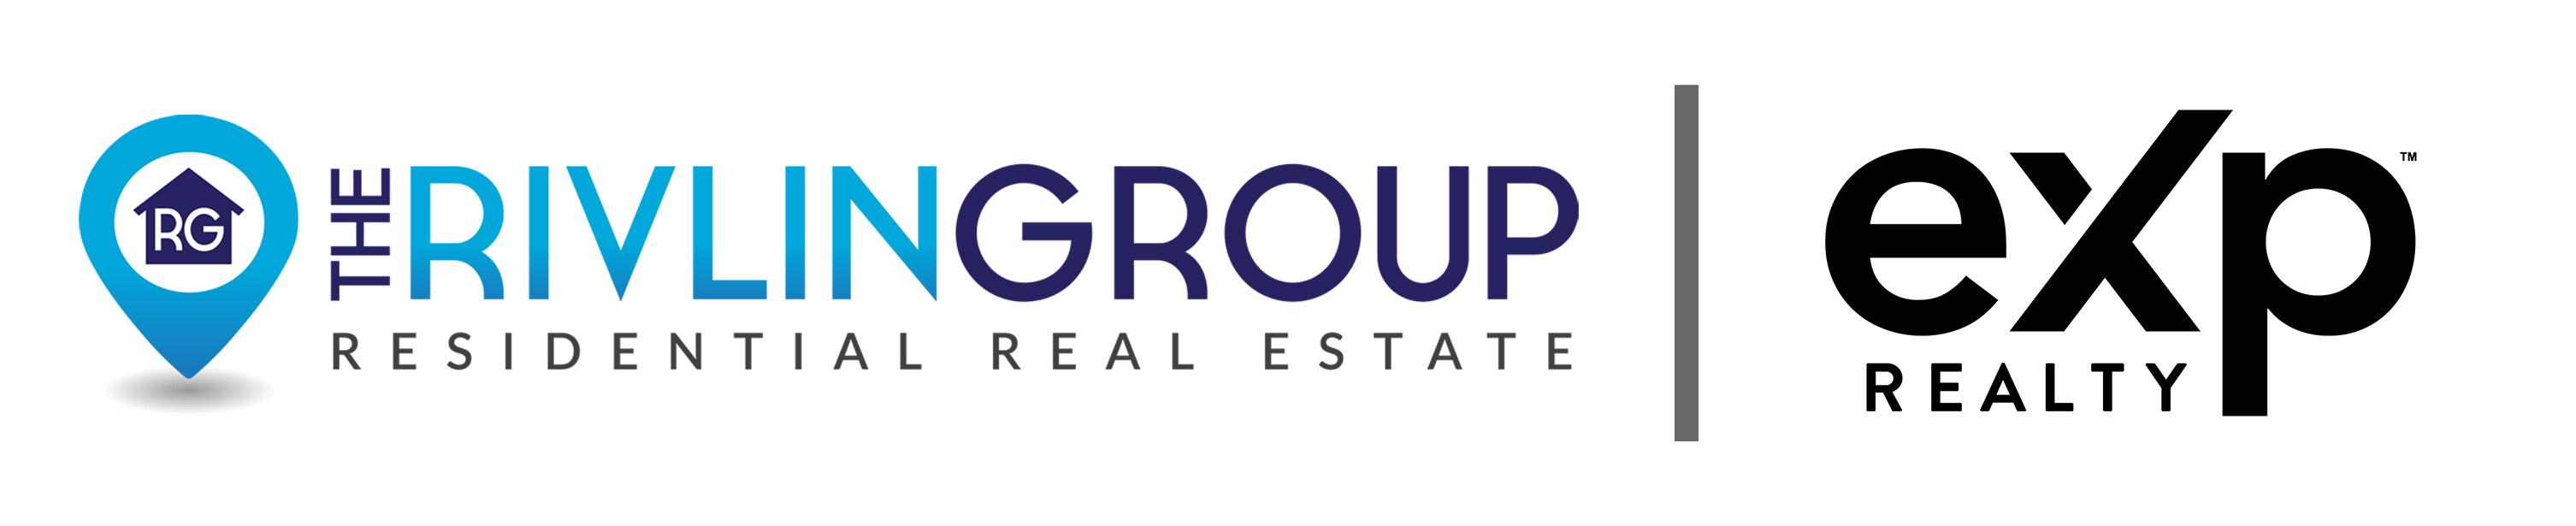 The Rivlin Group logo